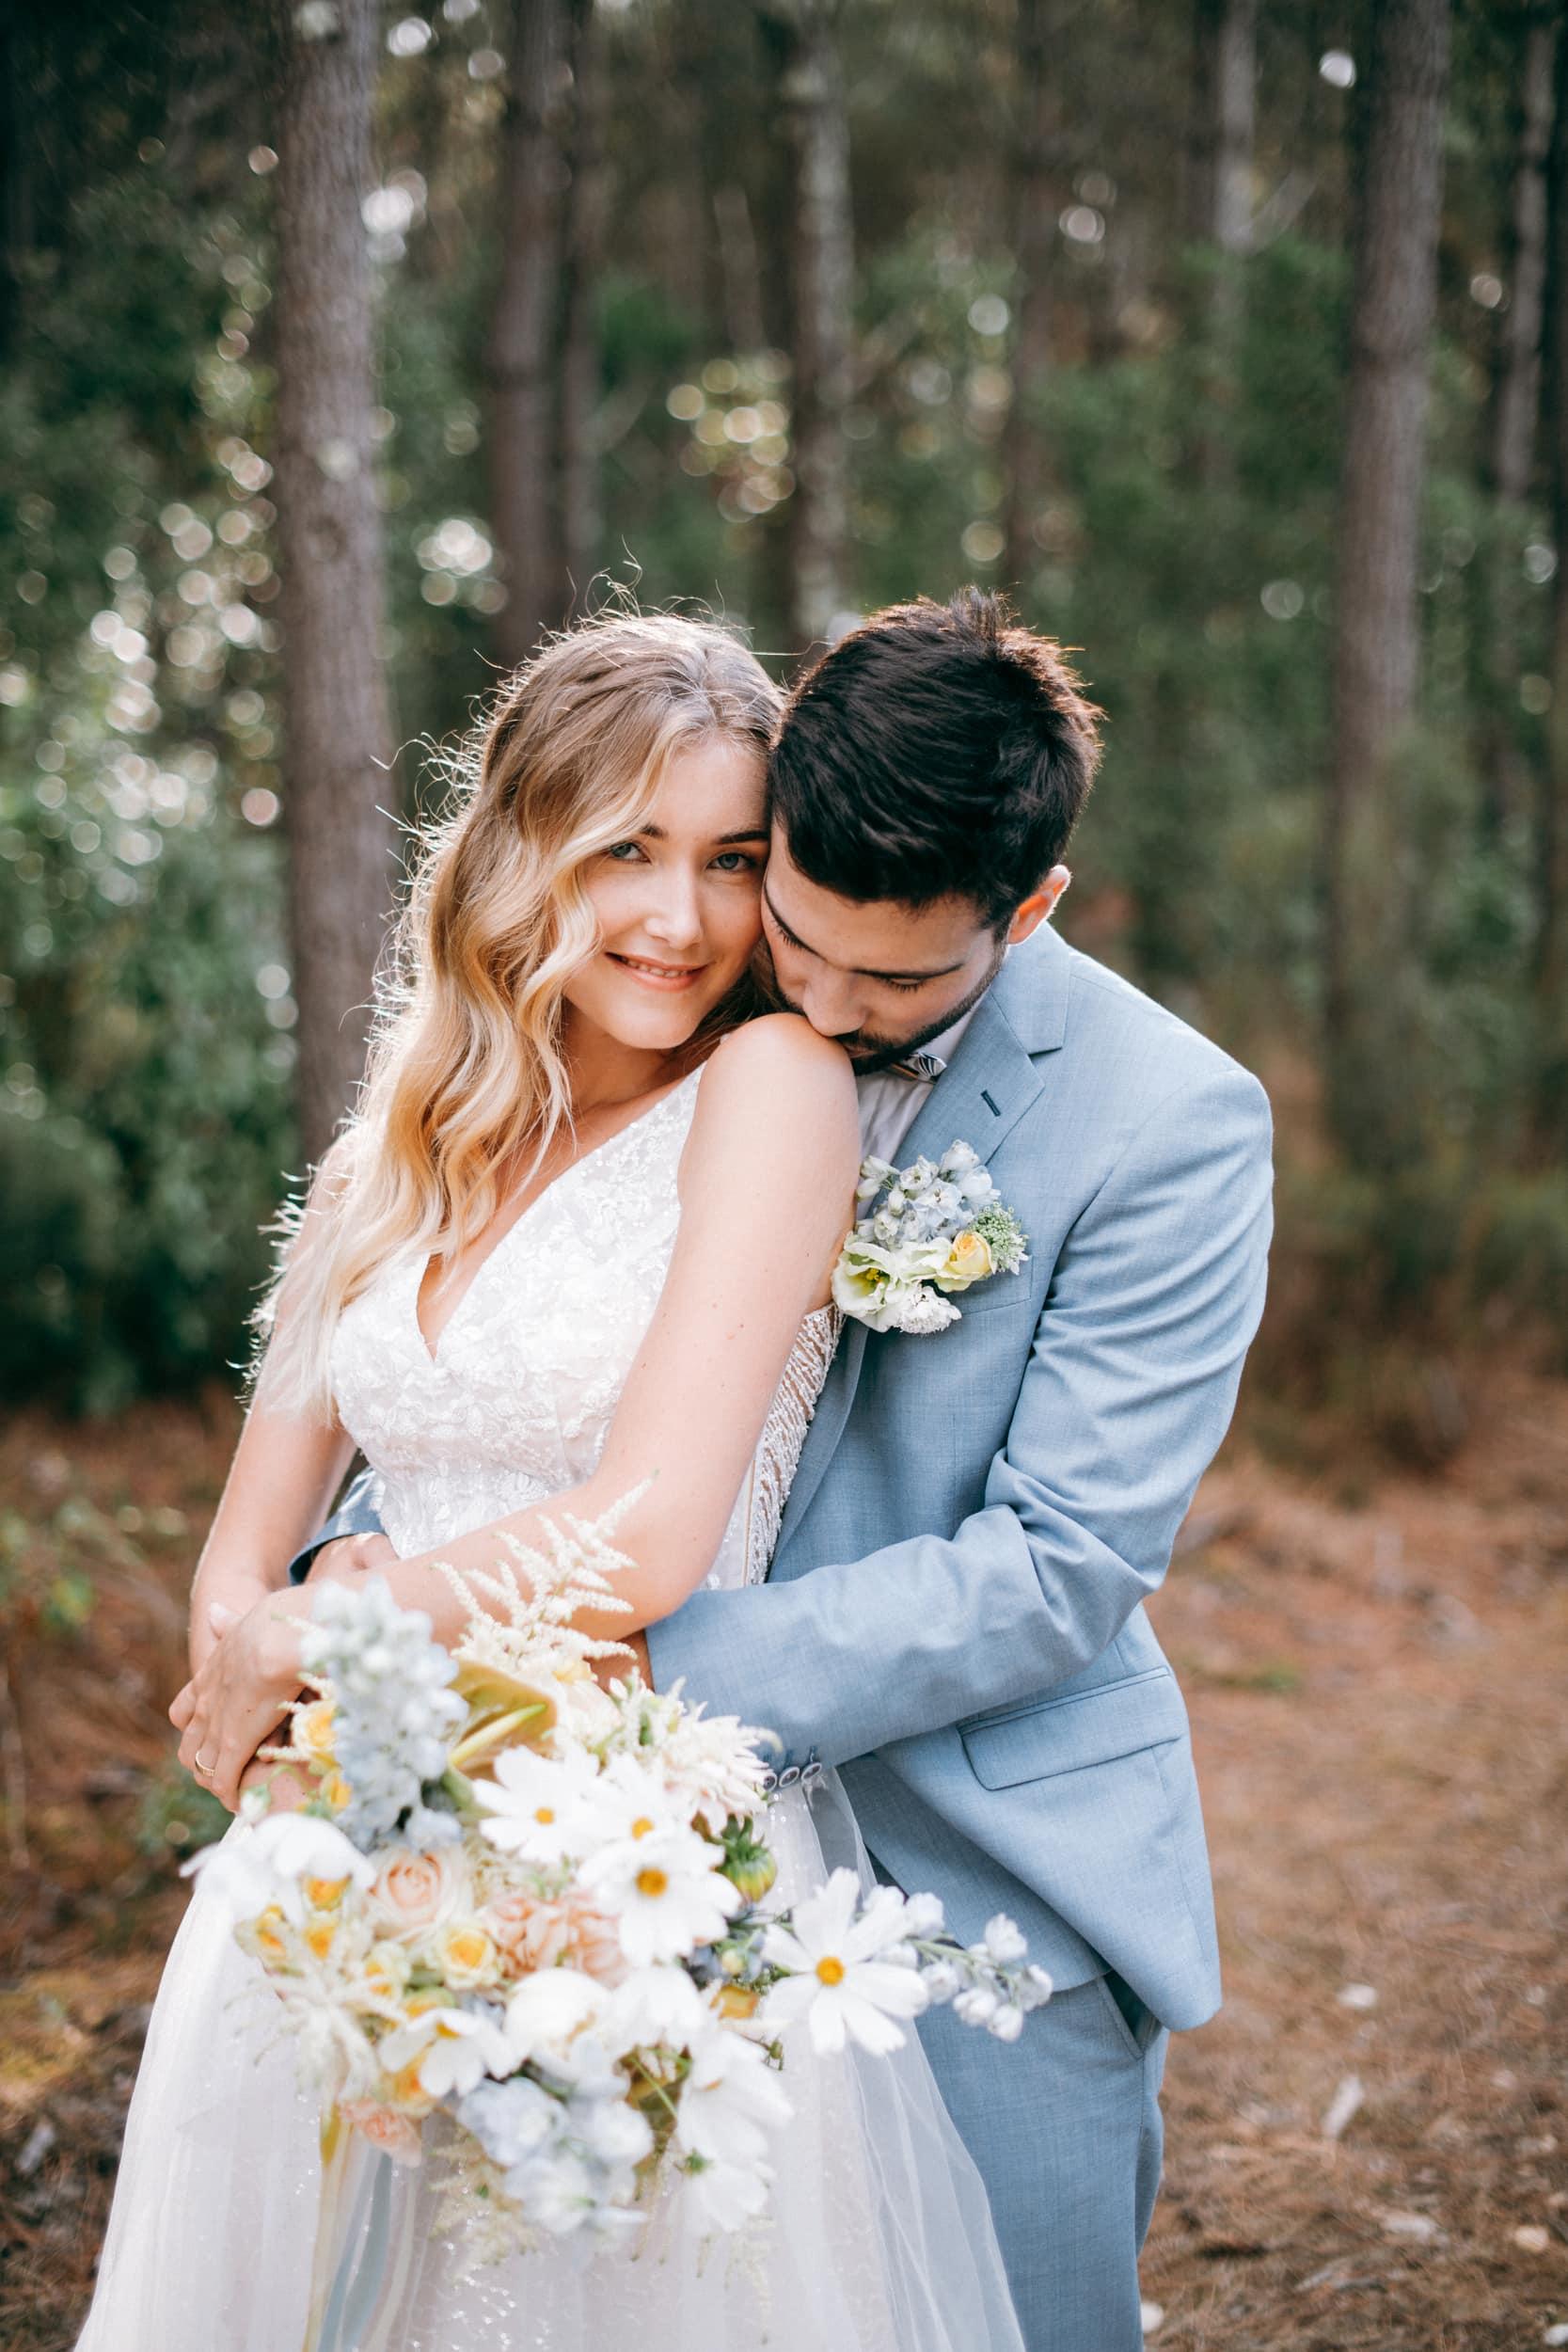 Arcachon-8950Photograhe mariage bordeaux arcachon